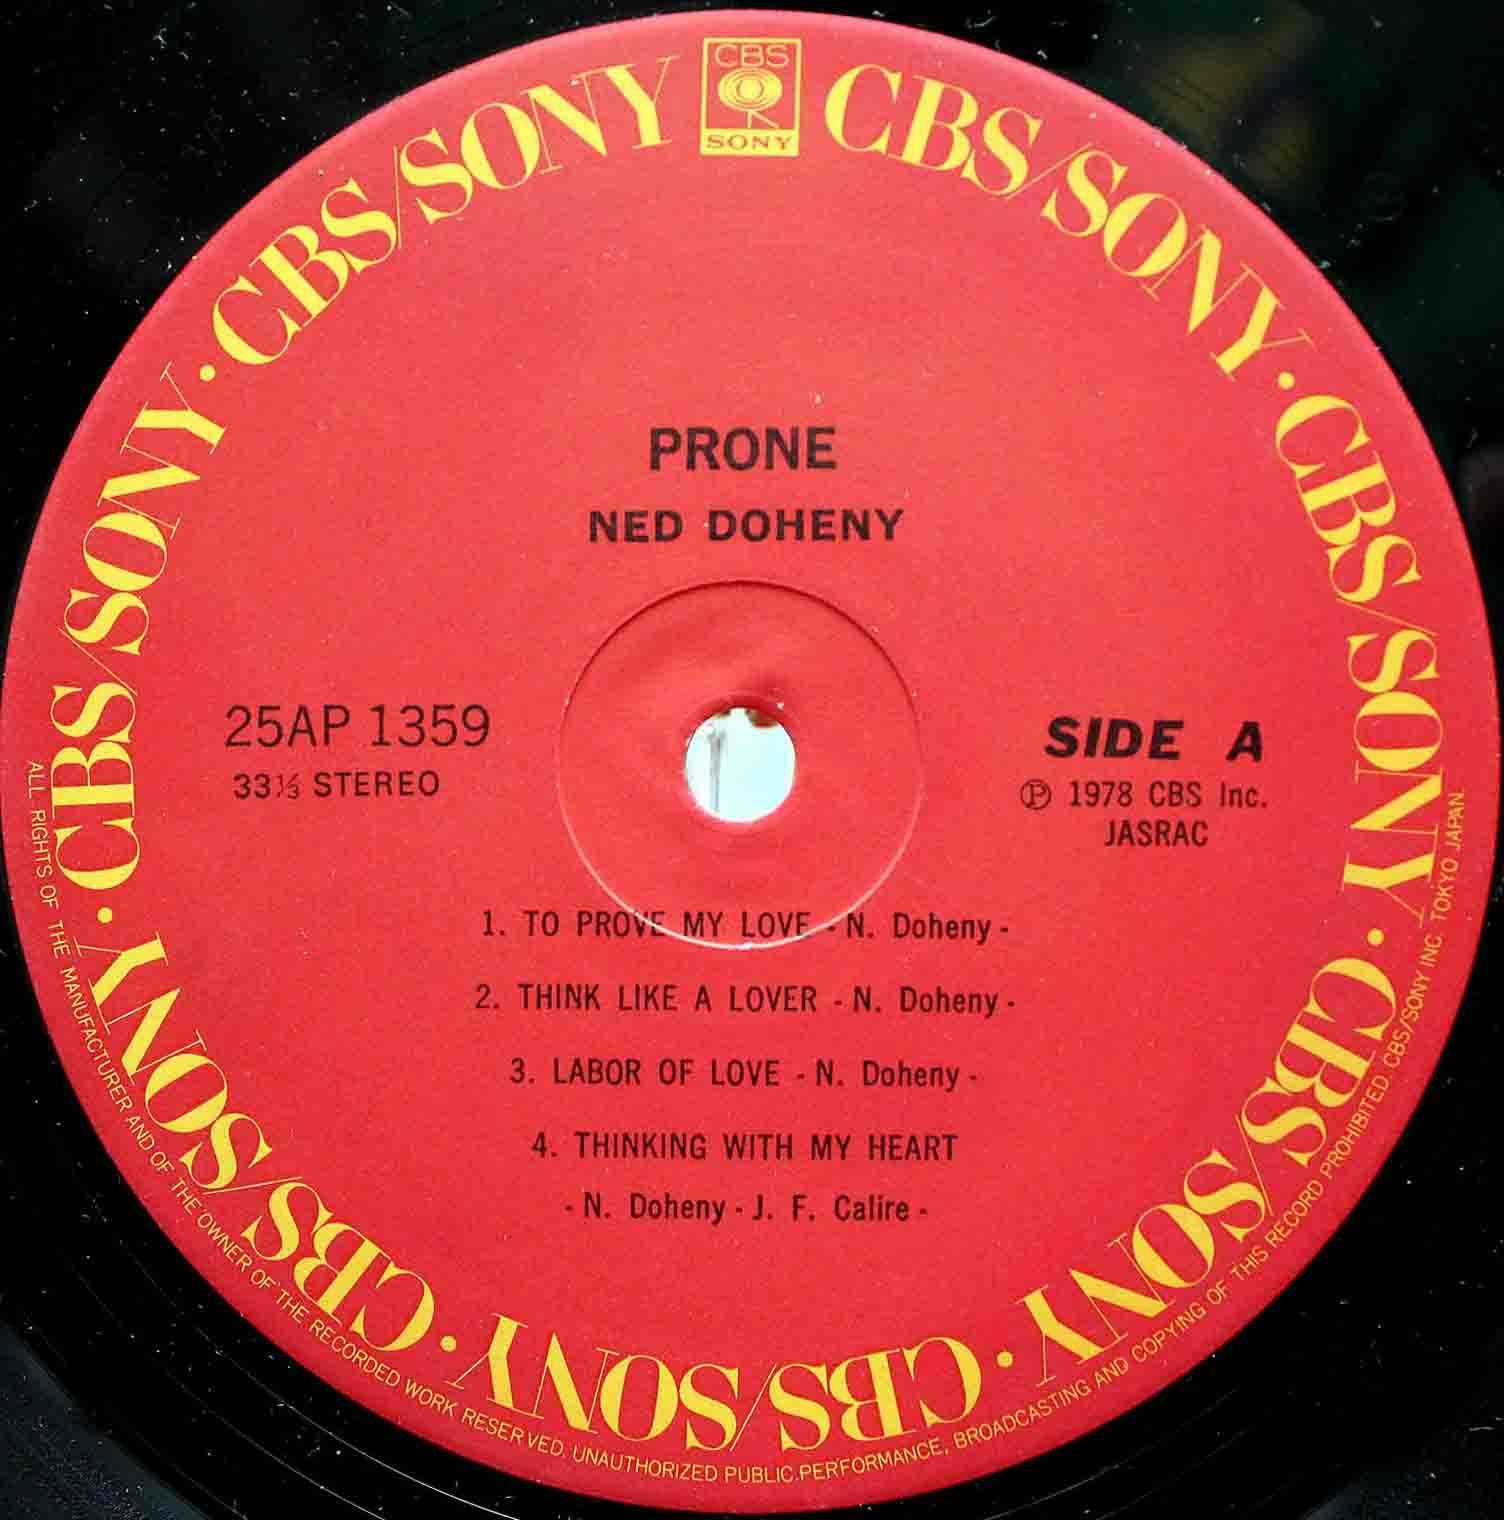 Ned Doheny Prone 05